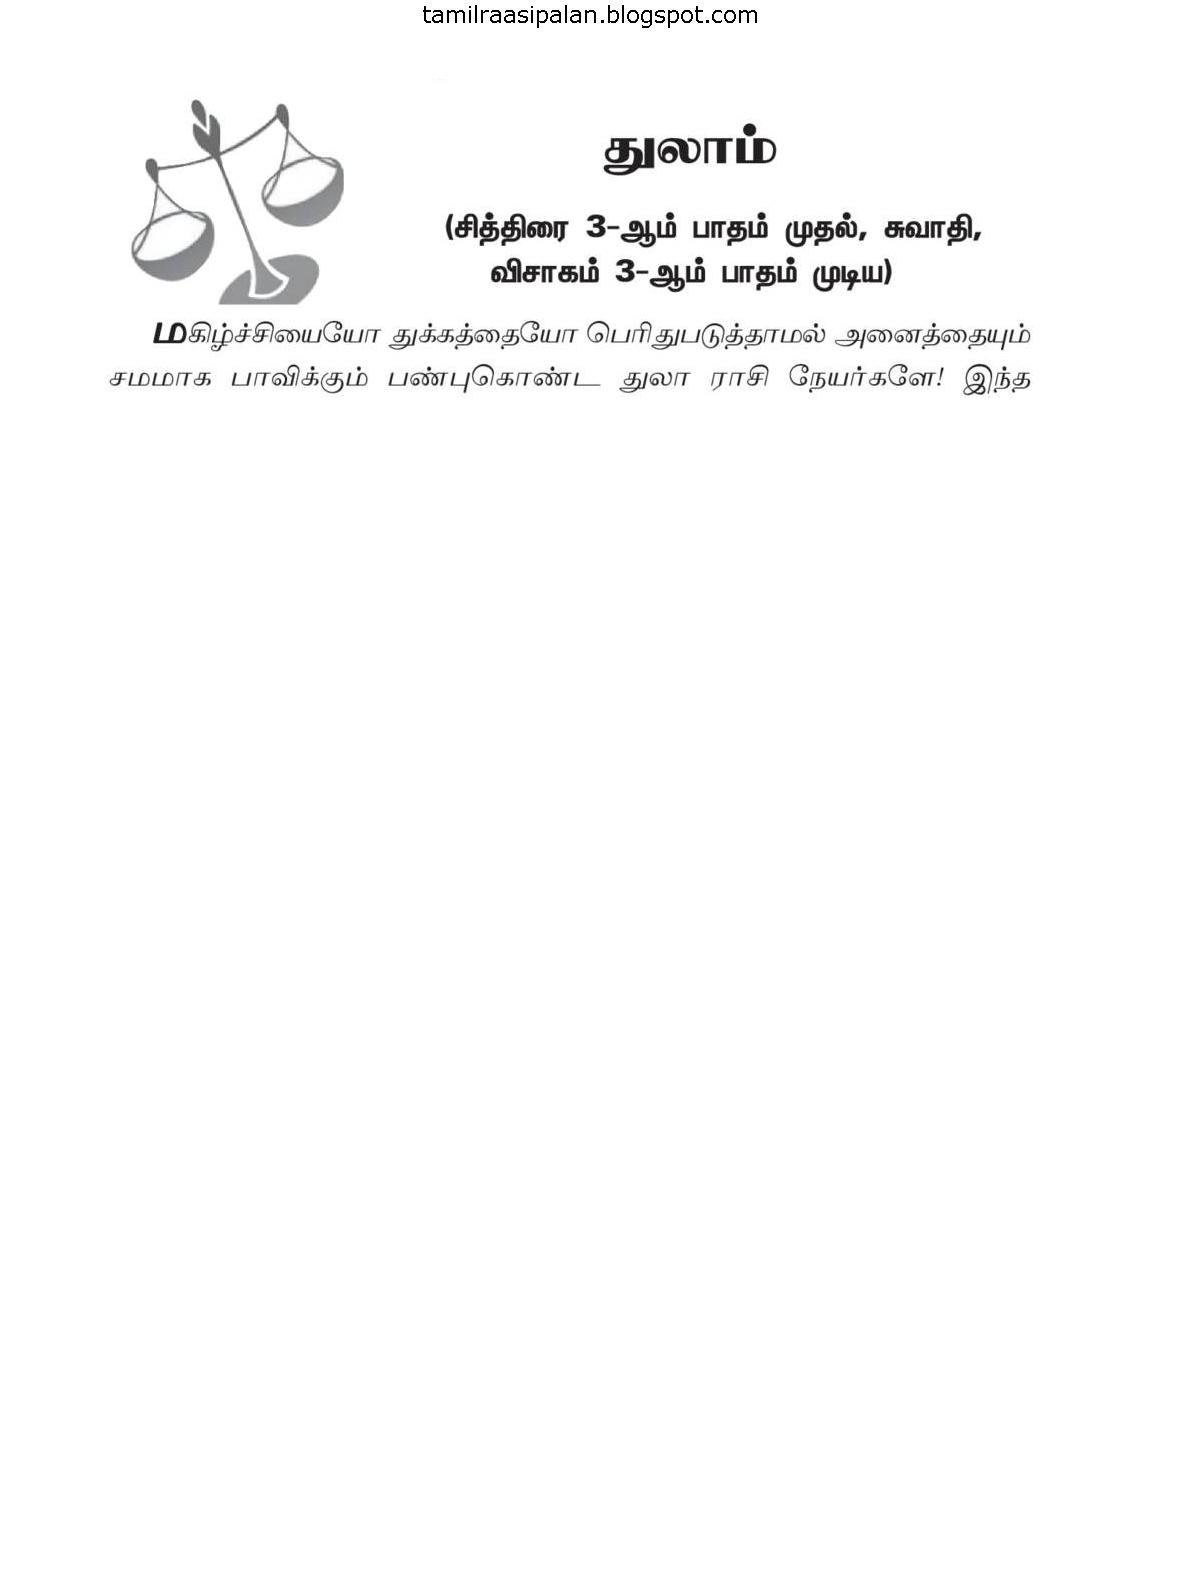 THULAM 2016 Full and Detailed Annual Rasi Palan Forecast